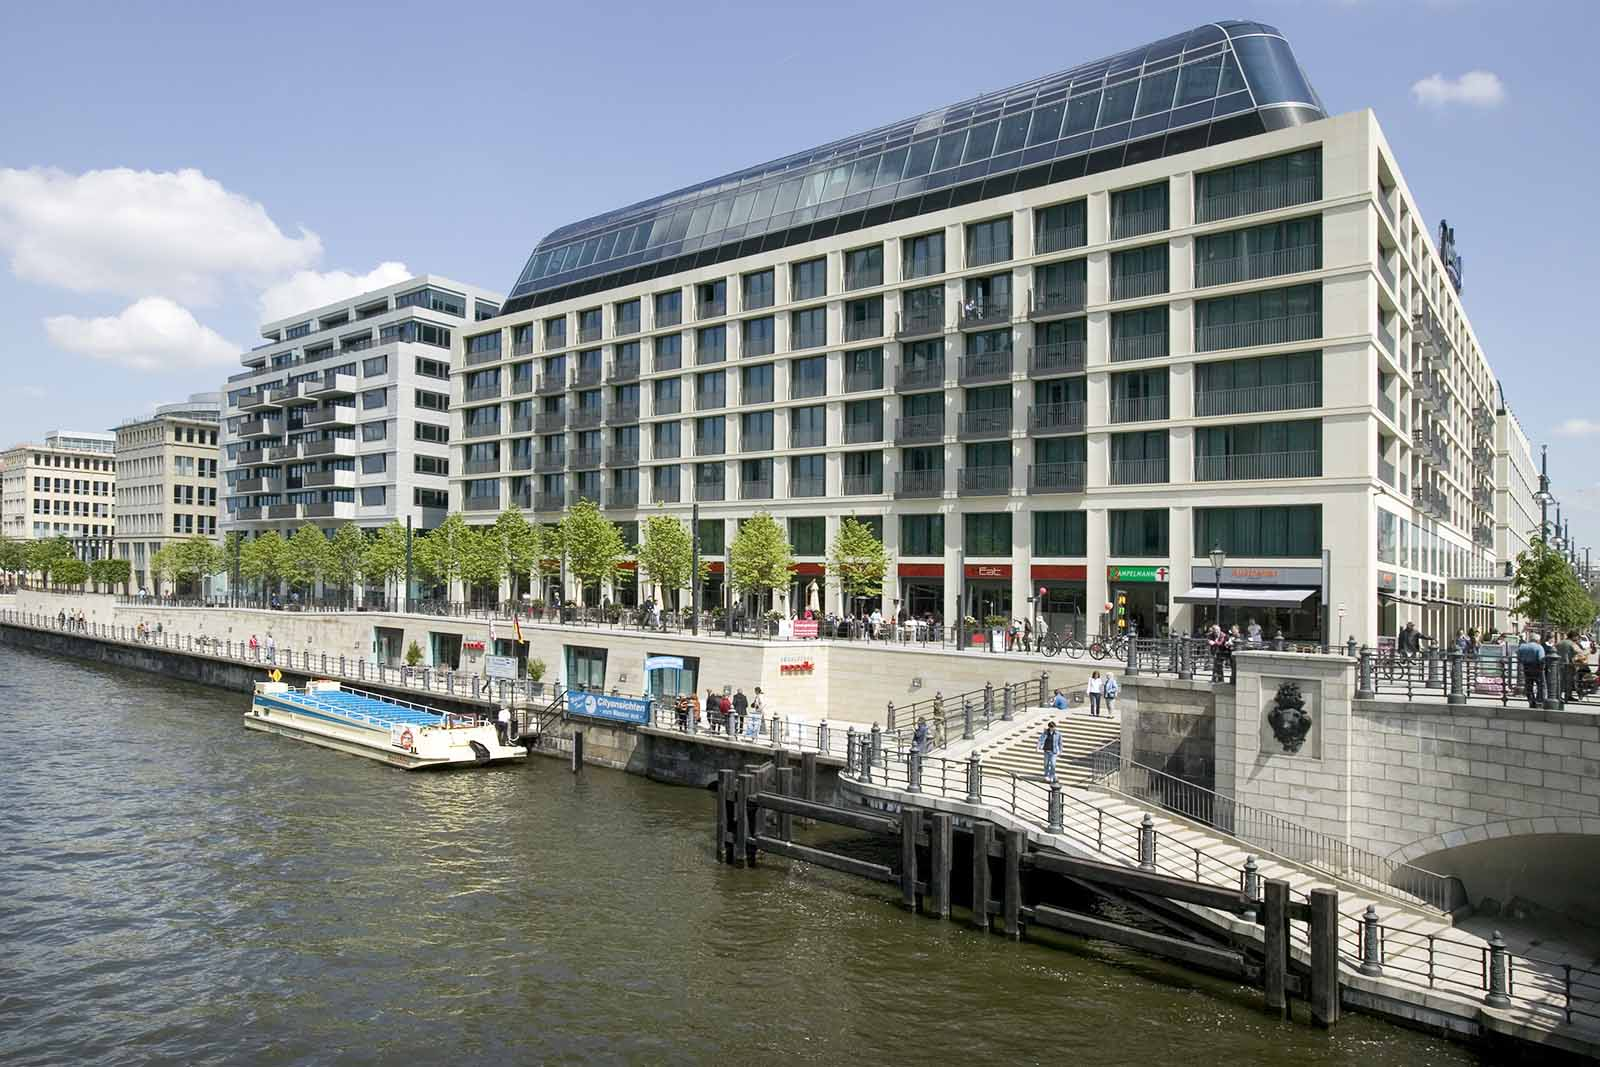 radisson blu hotel, berlin | dirk hasskarl/fotografie